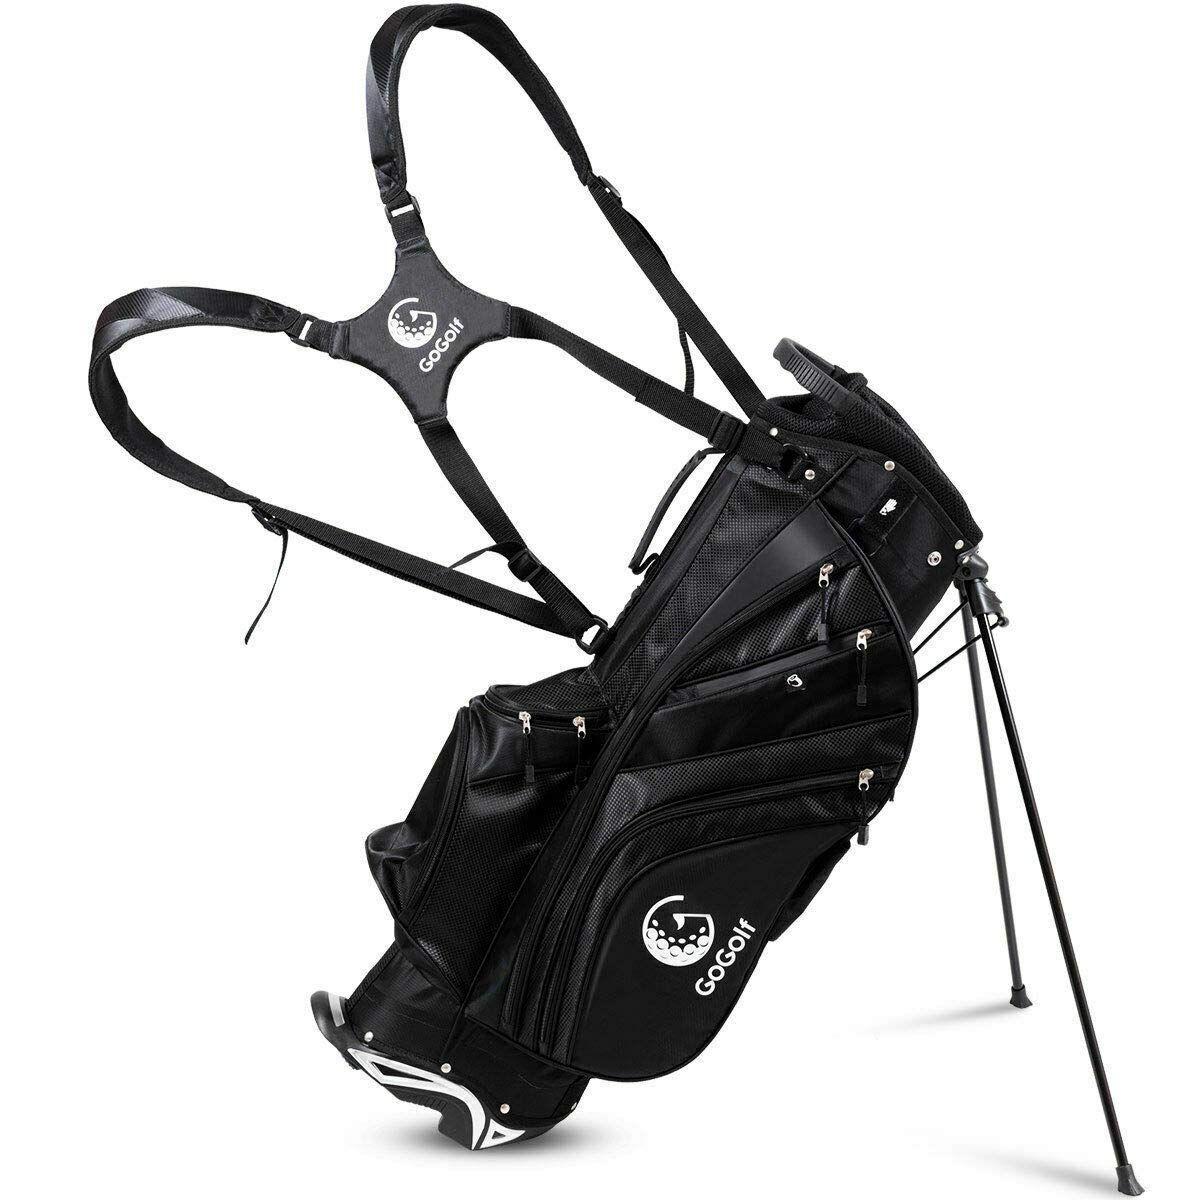 Tangkula Golf Stand Bag, Lightweight and LargeCapacity